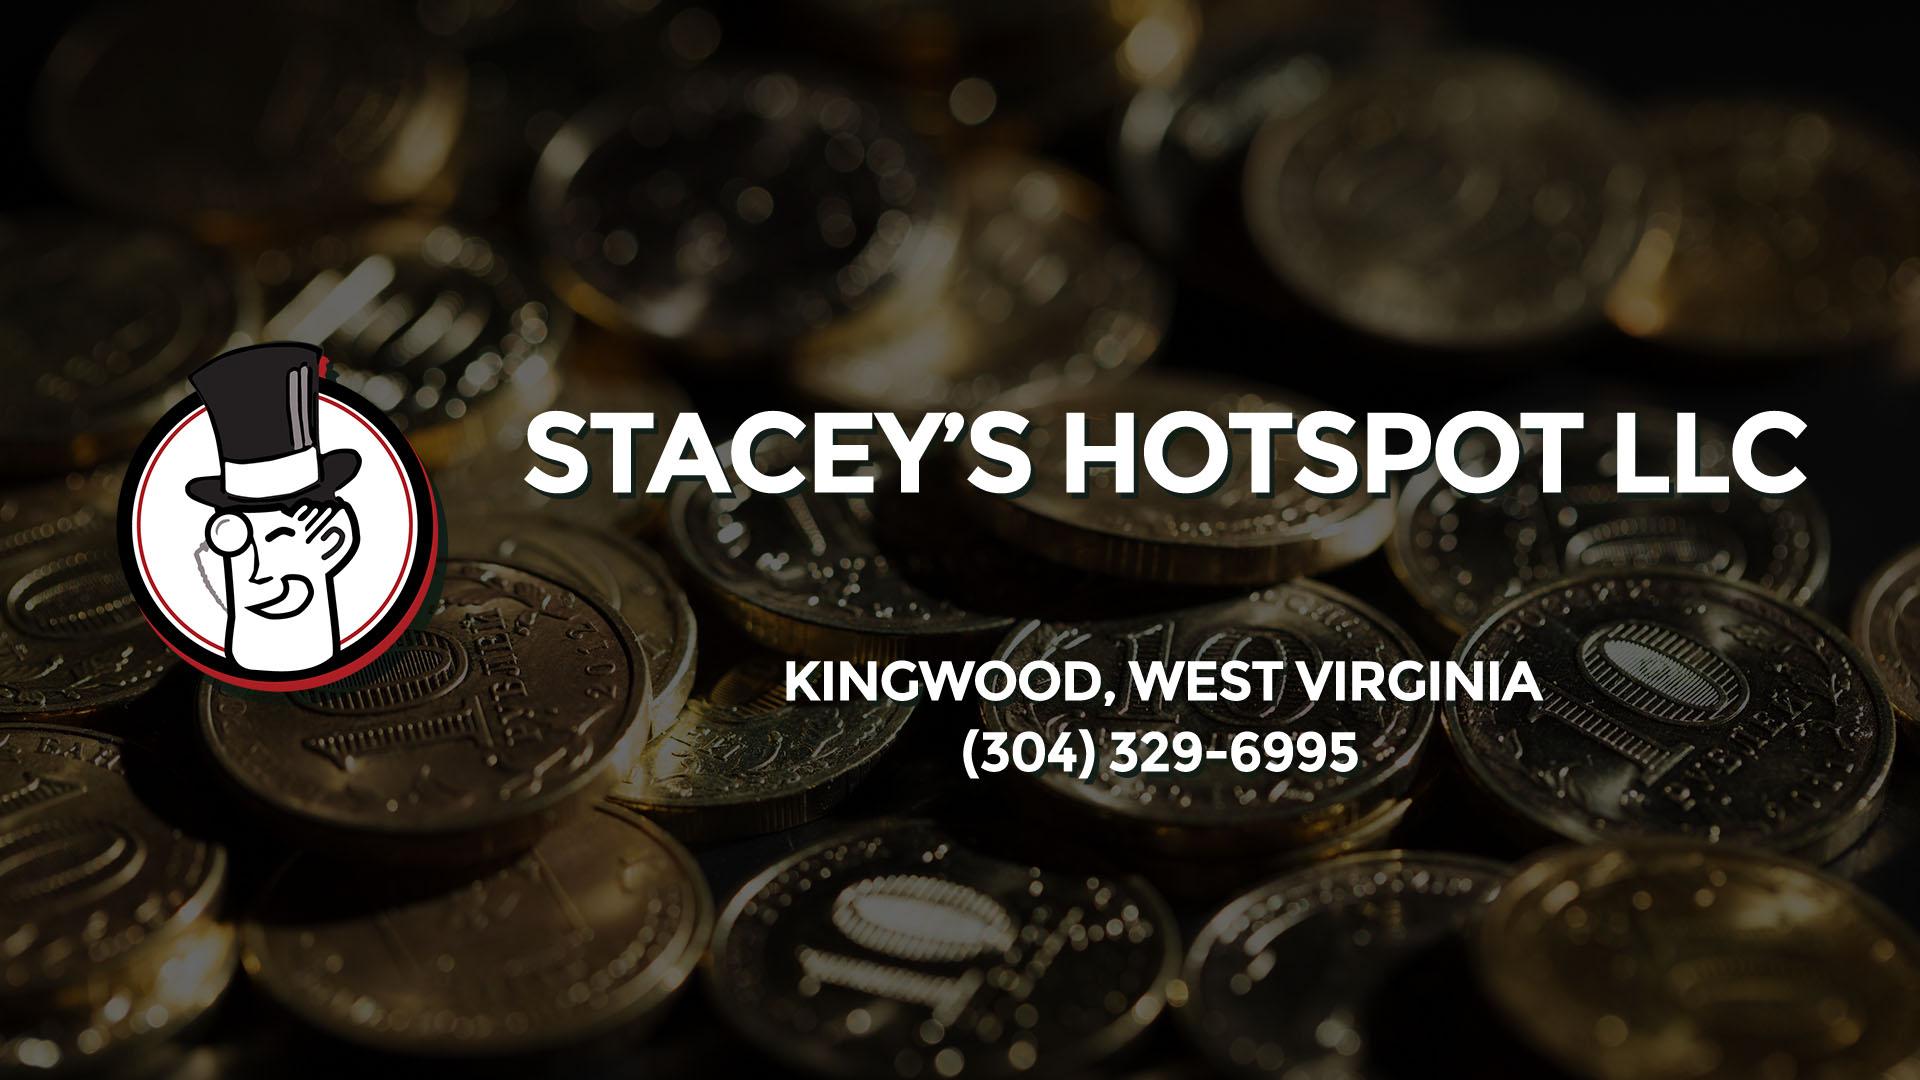 STACEY'S HOTSPOT LLC KINGWOOD WV